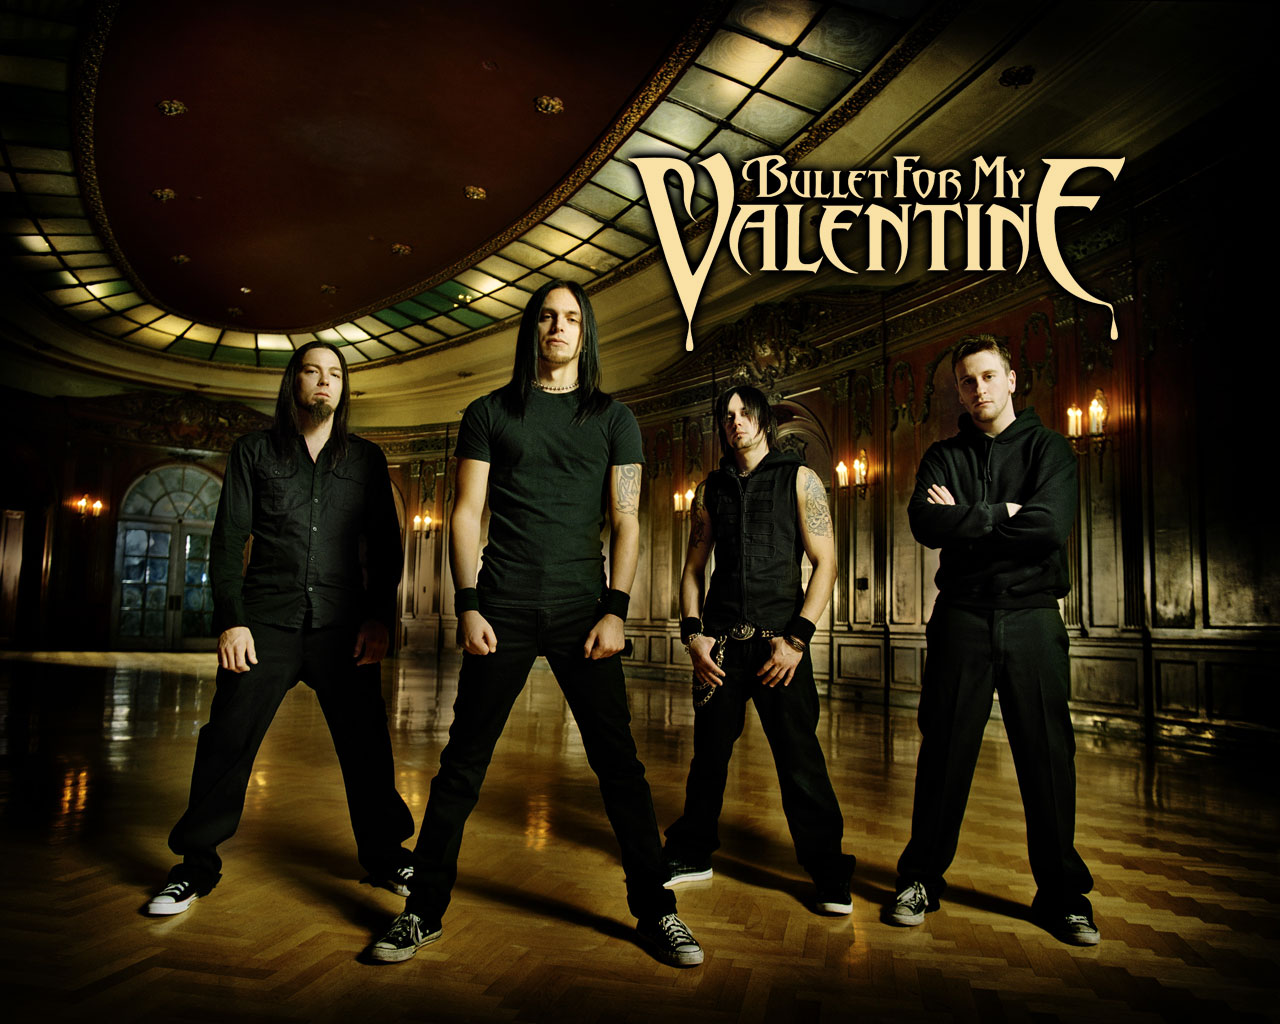 Discografia de Bullet For My Valentine [Completa]